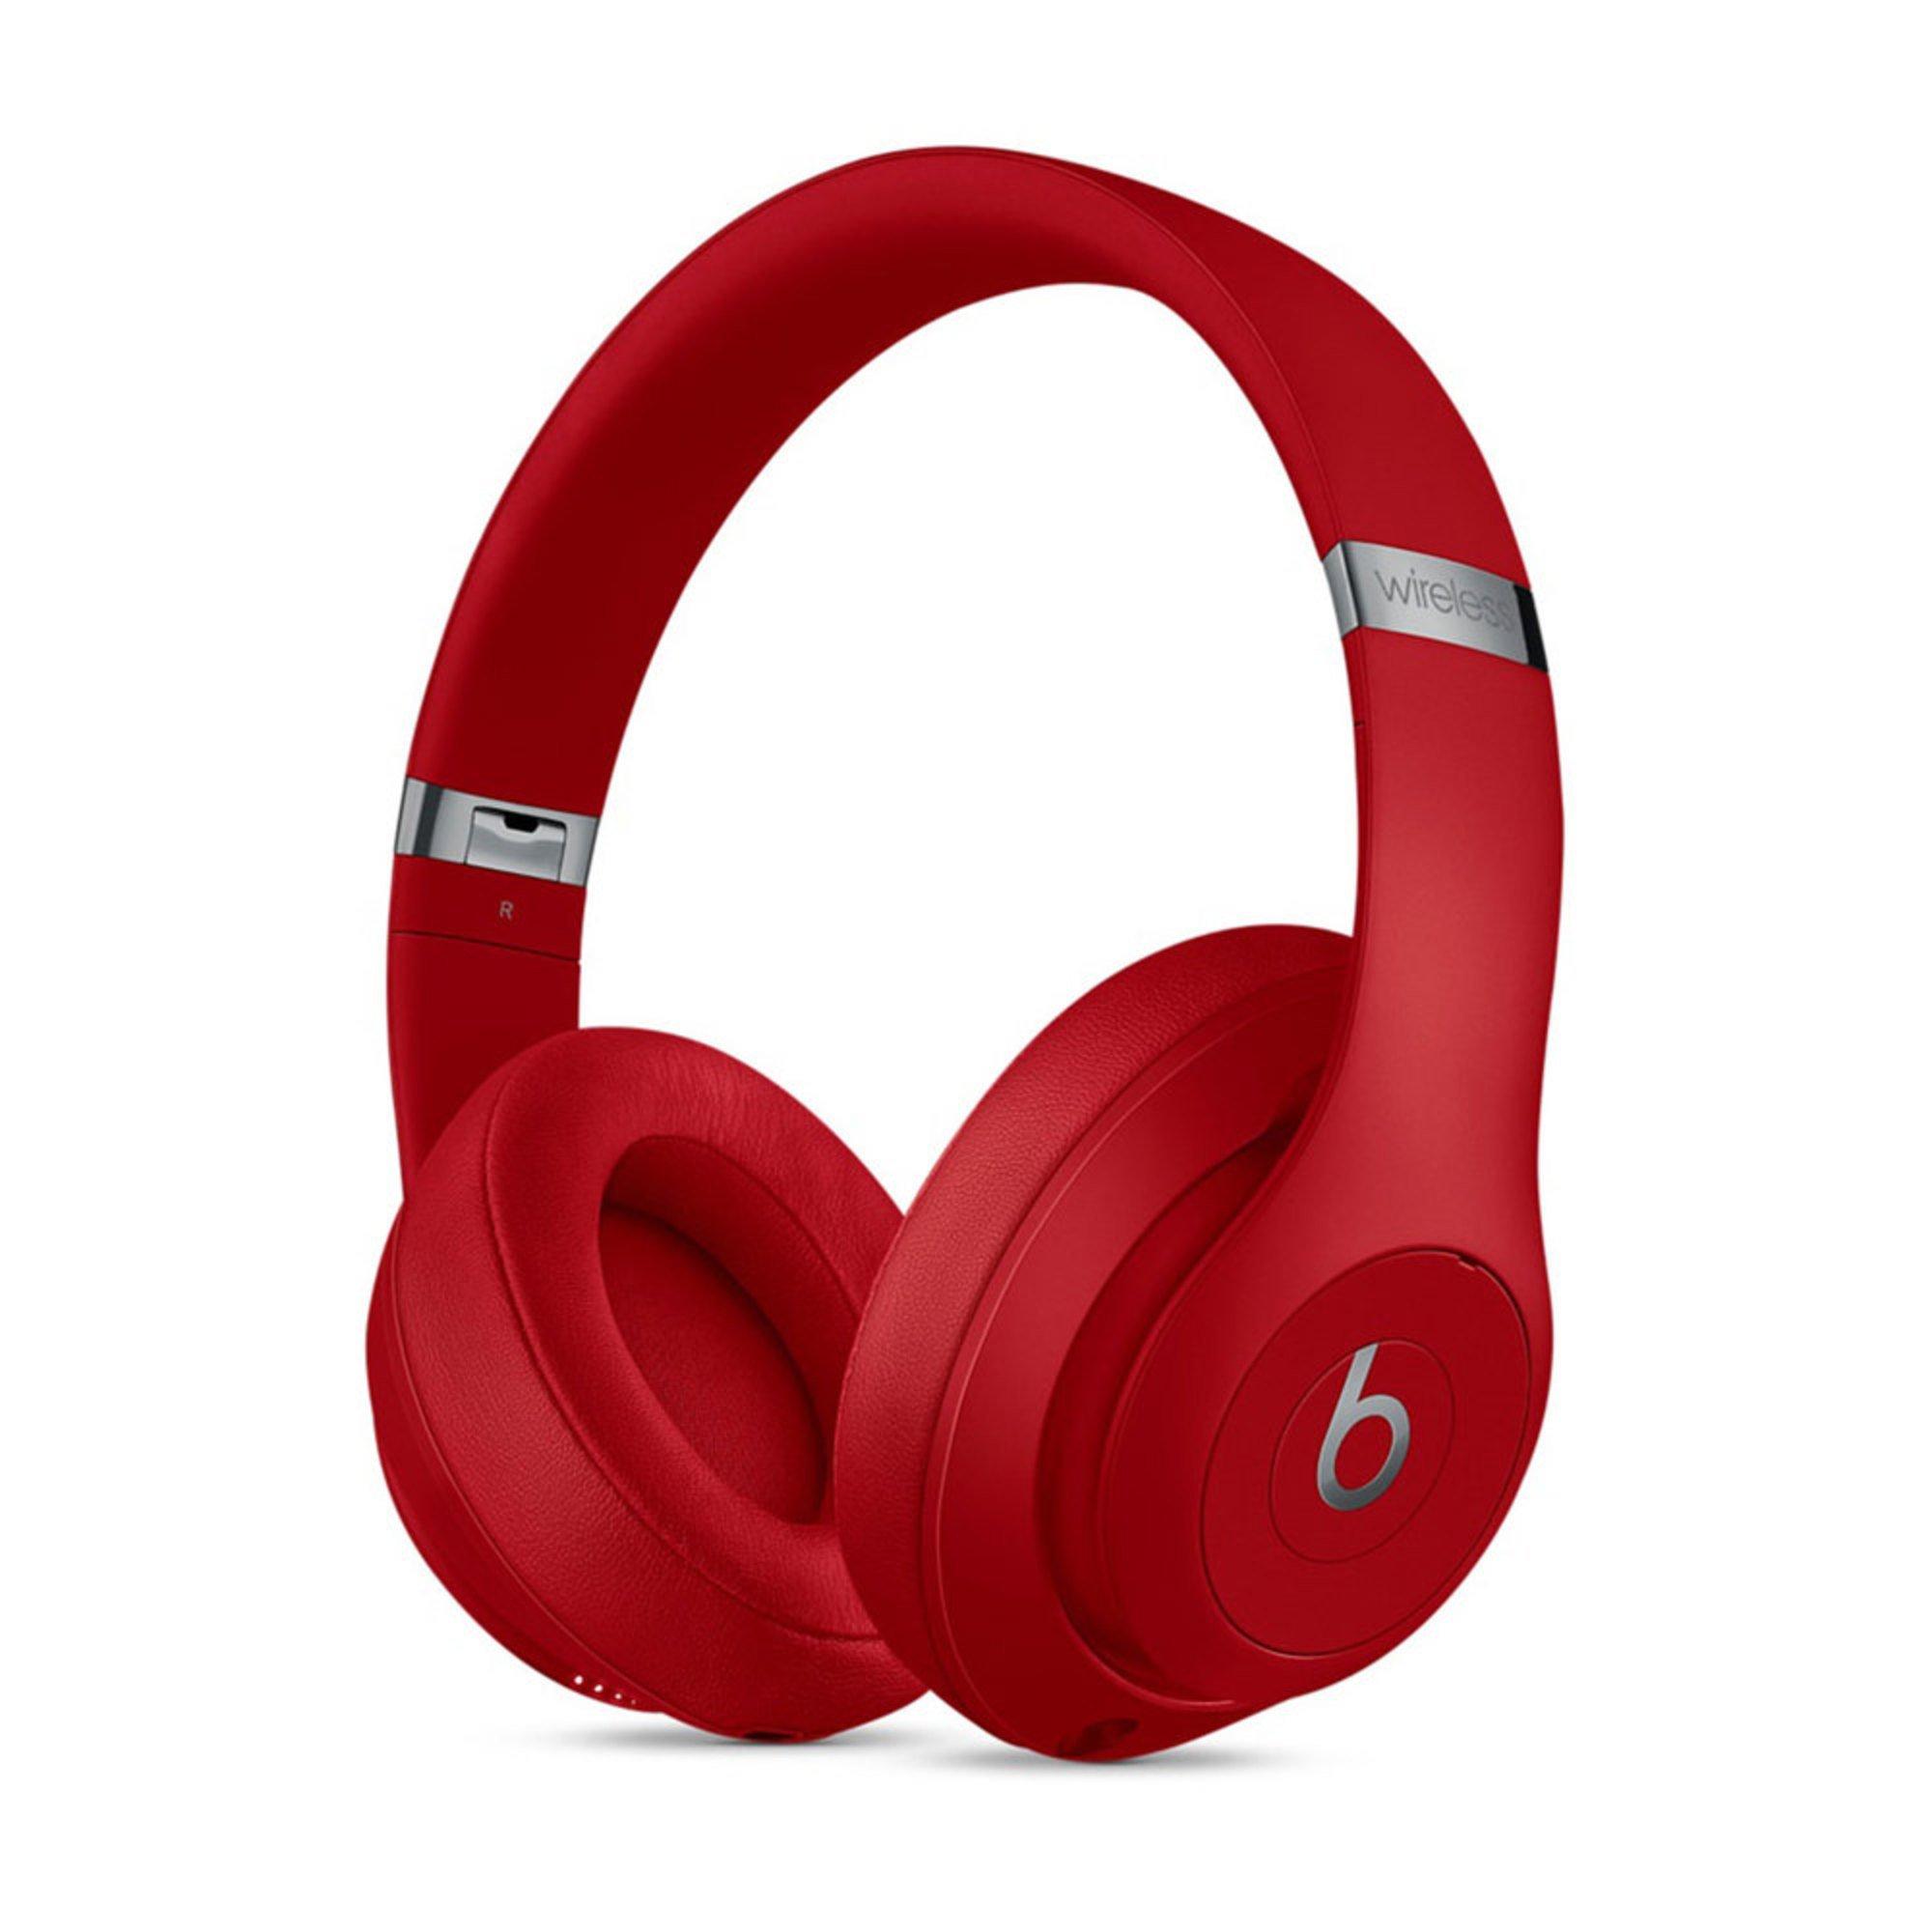 1bacb196dd5 Beats By Dre Studio 3 Wireless Headphones-red | Over-ear Headphones ...